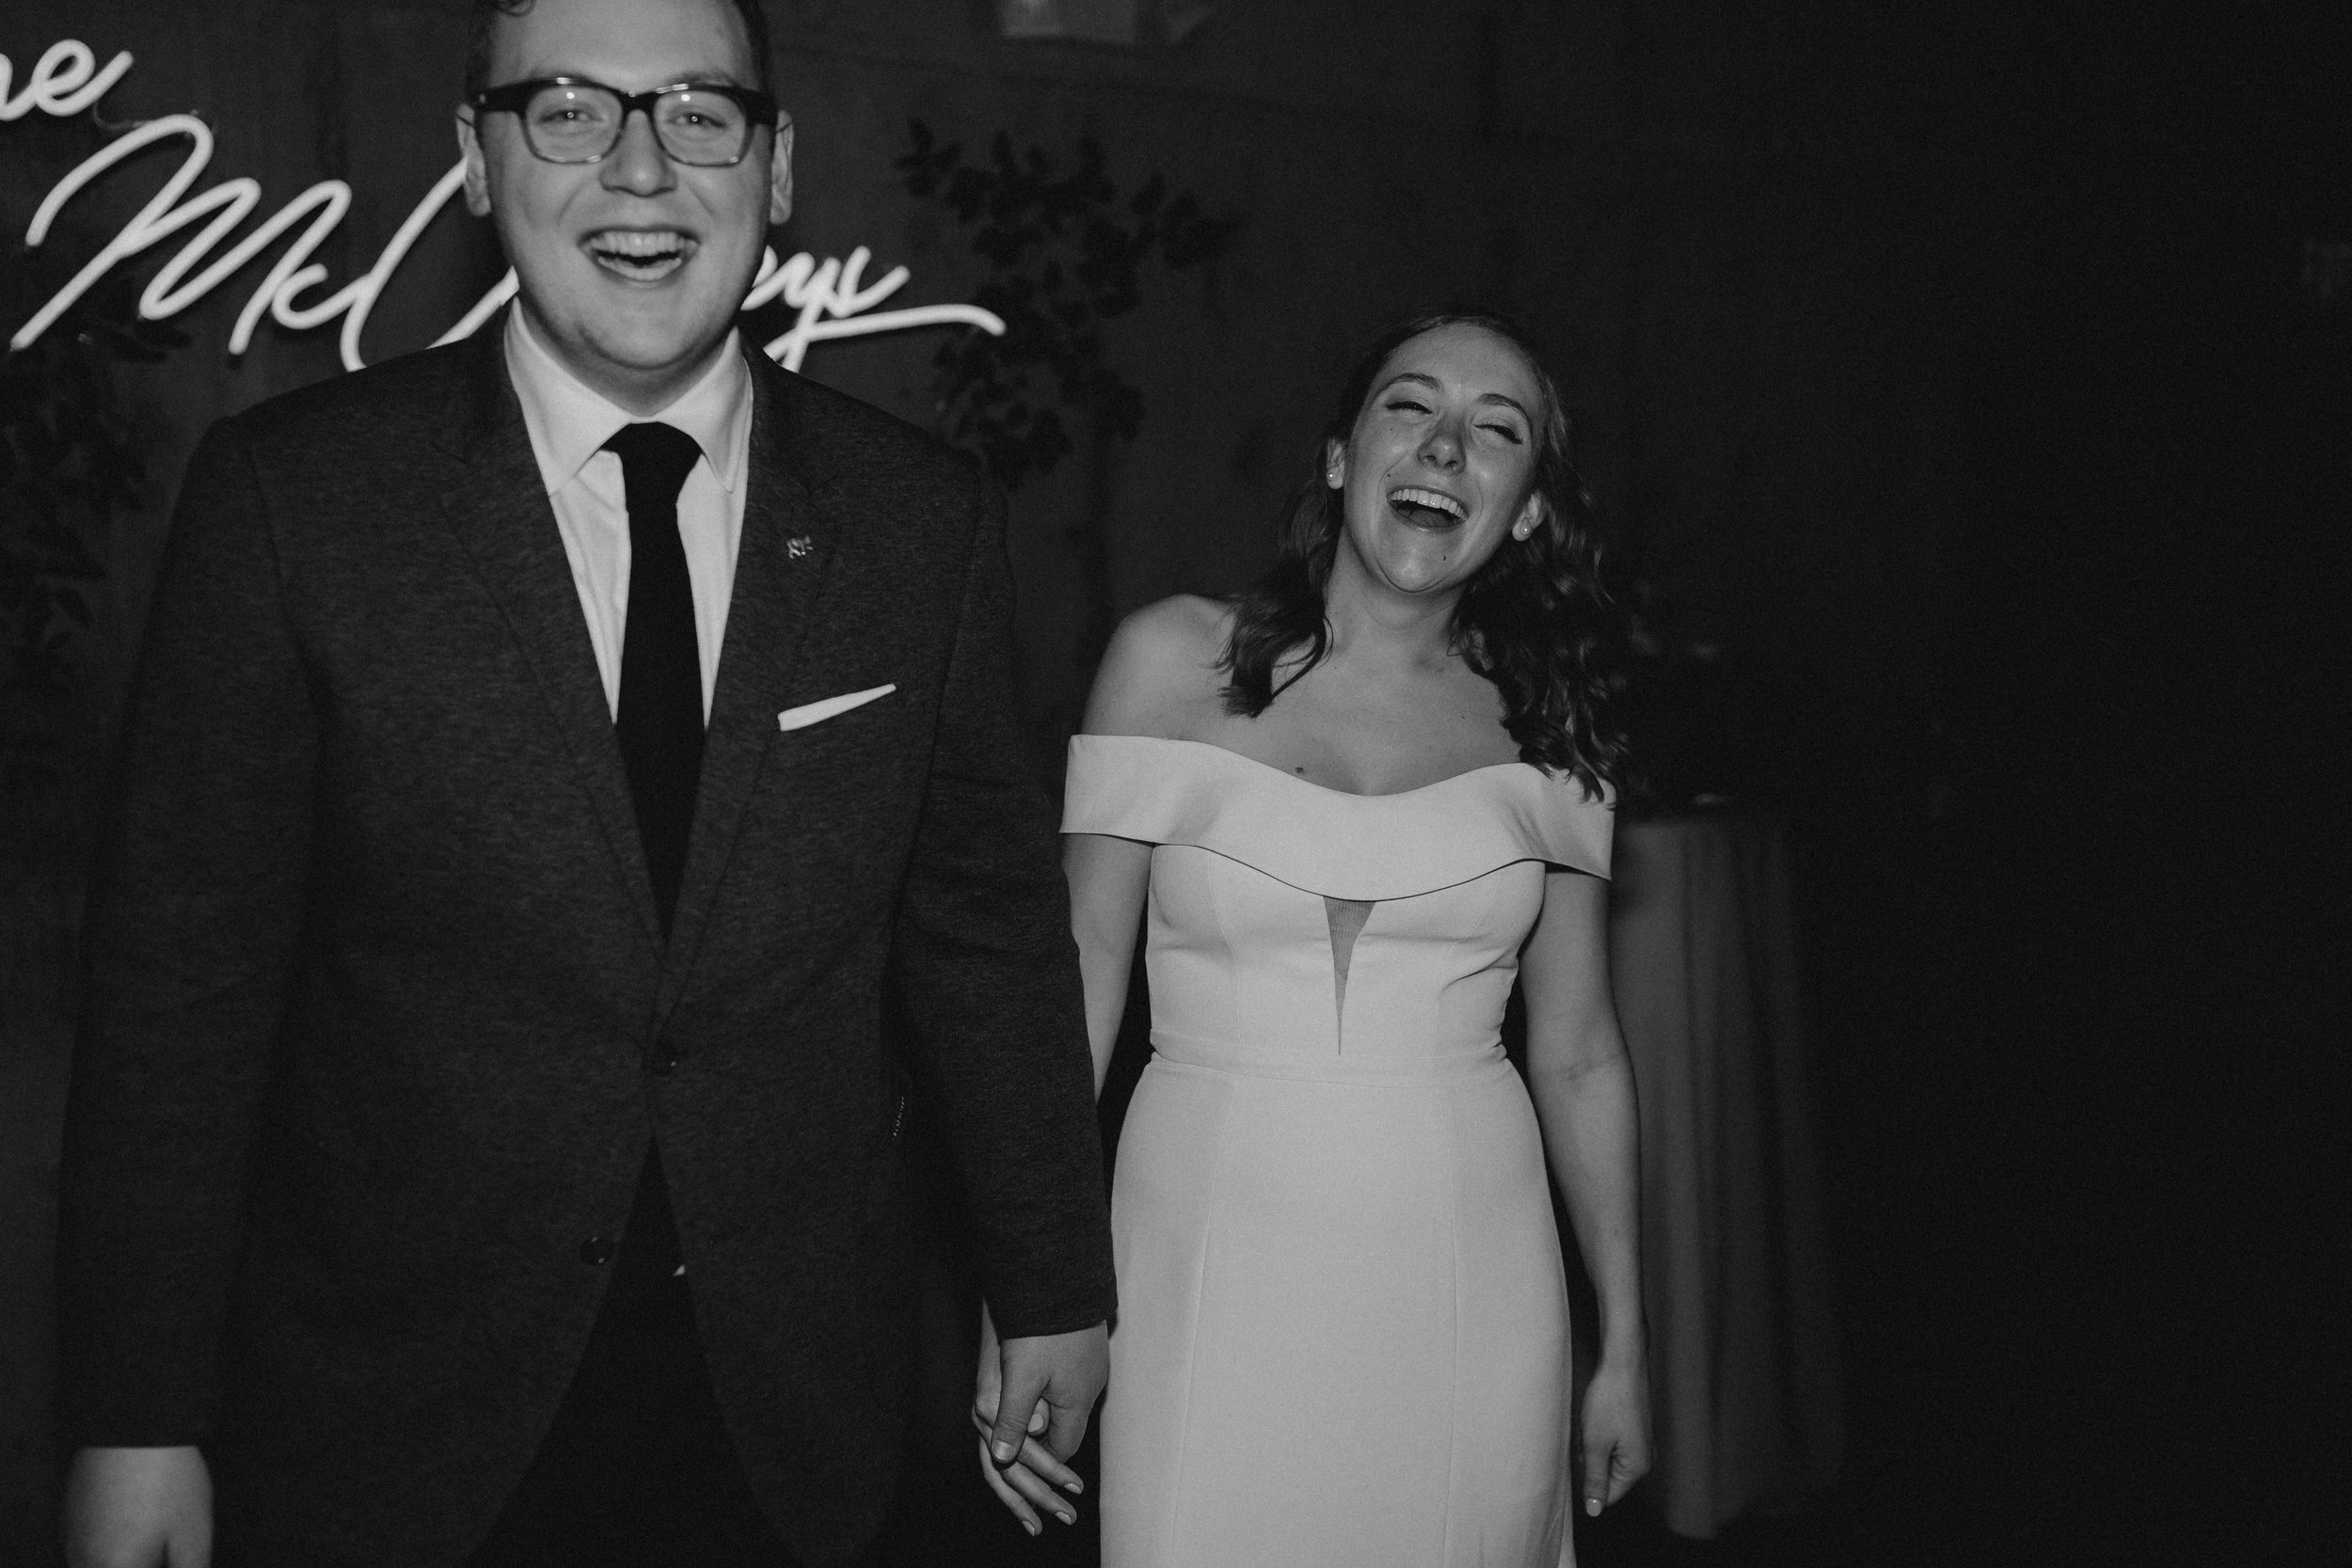 fremont_foundry_seattle_wedding_oliviastrohm___-24.jpg